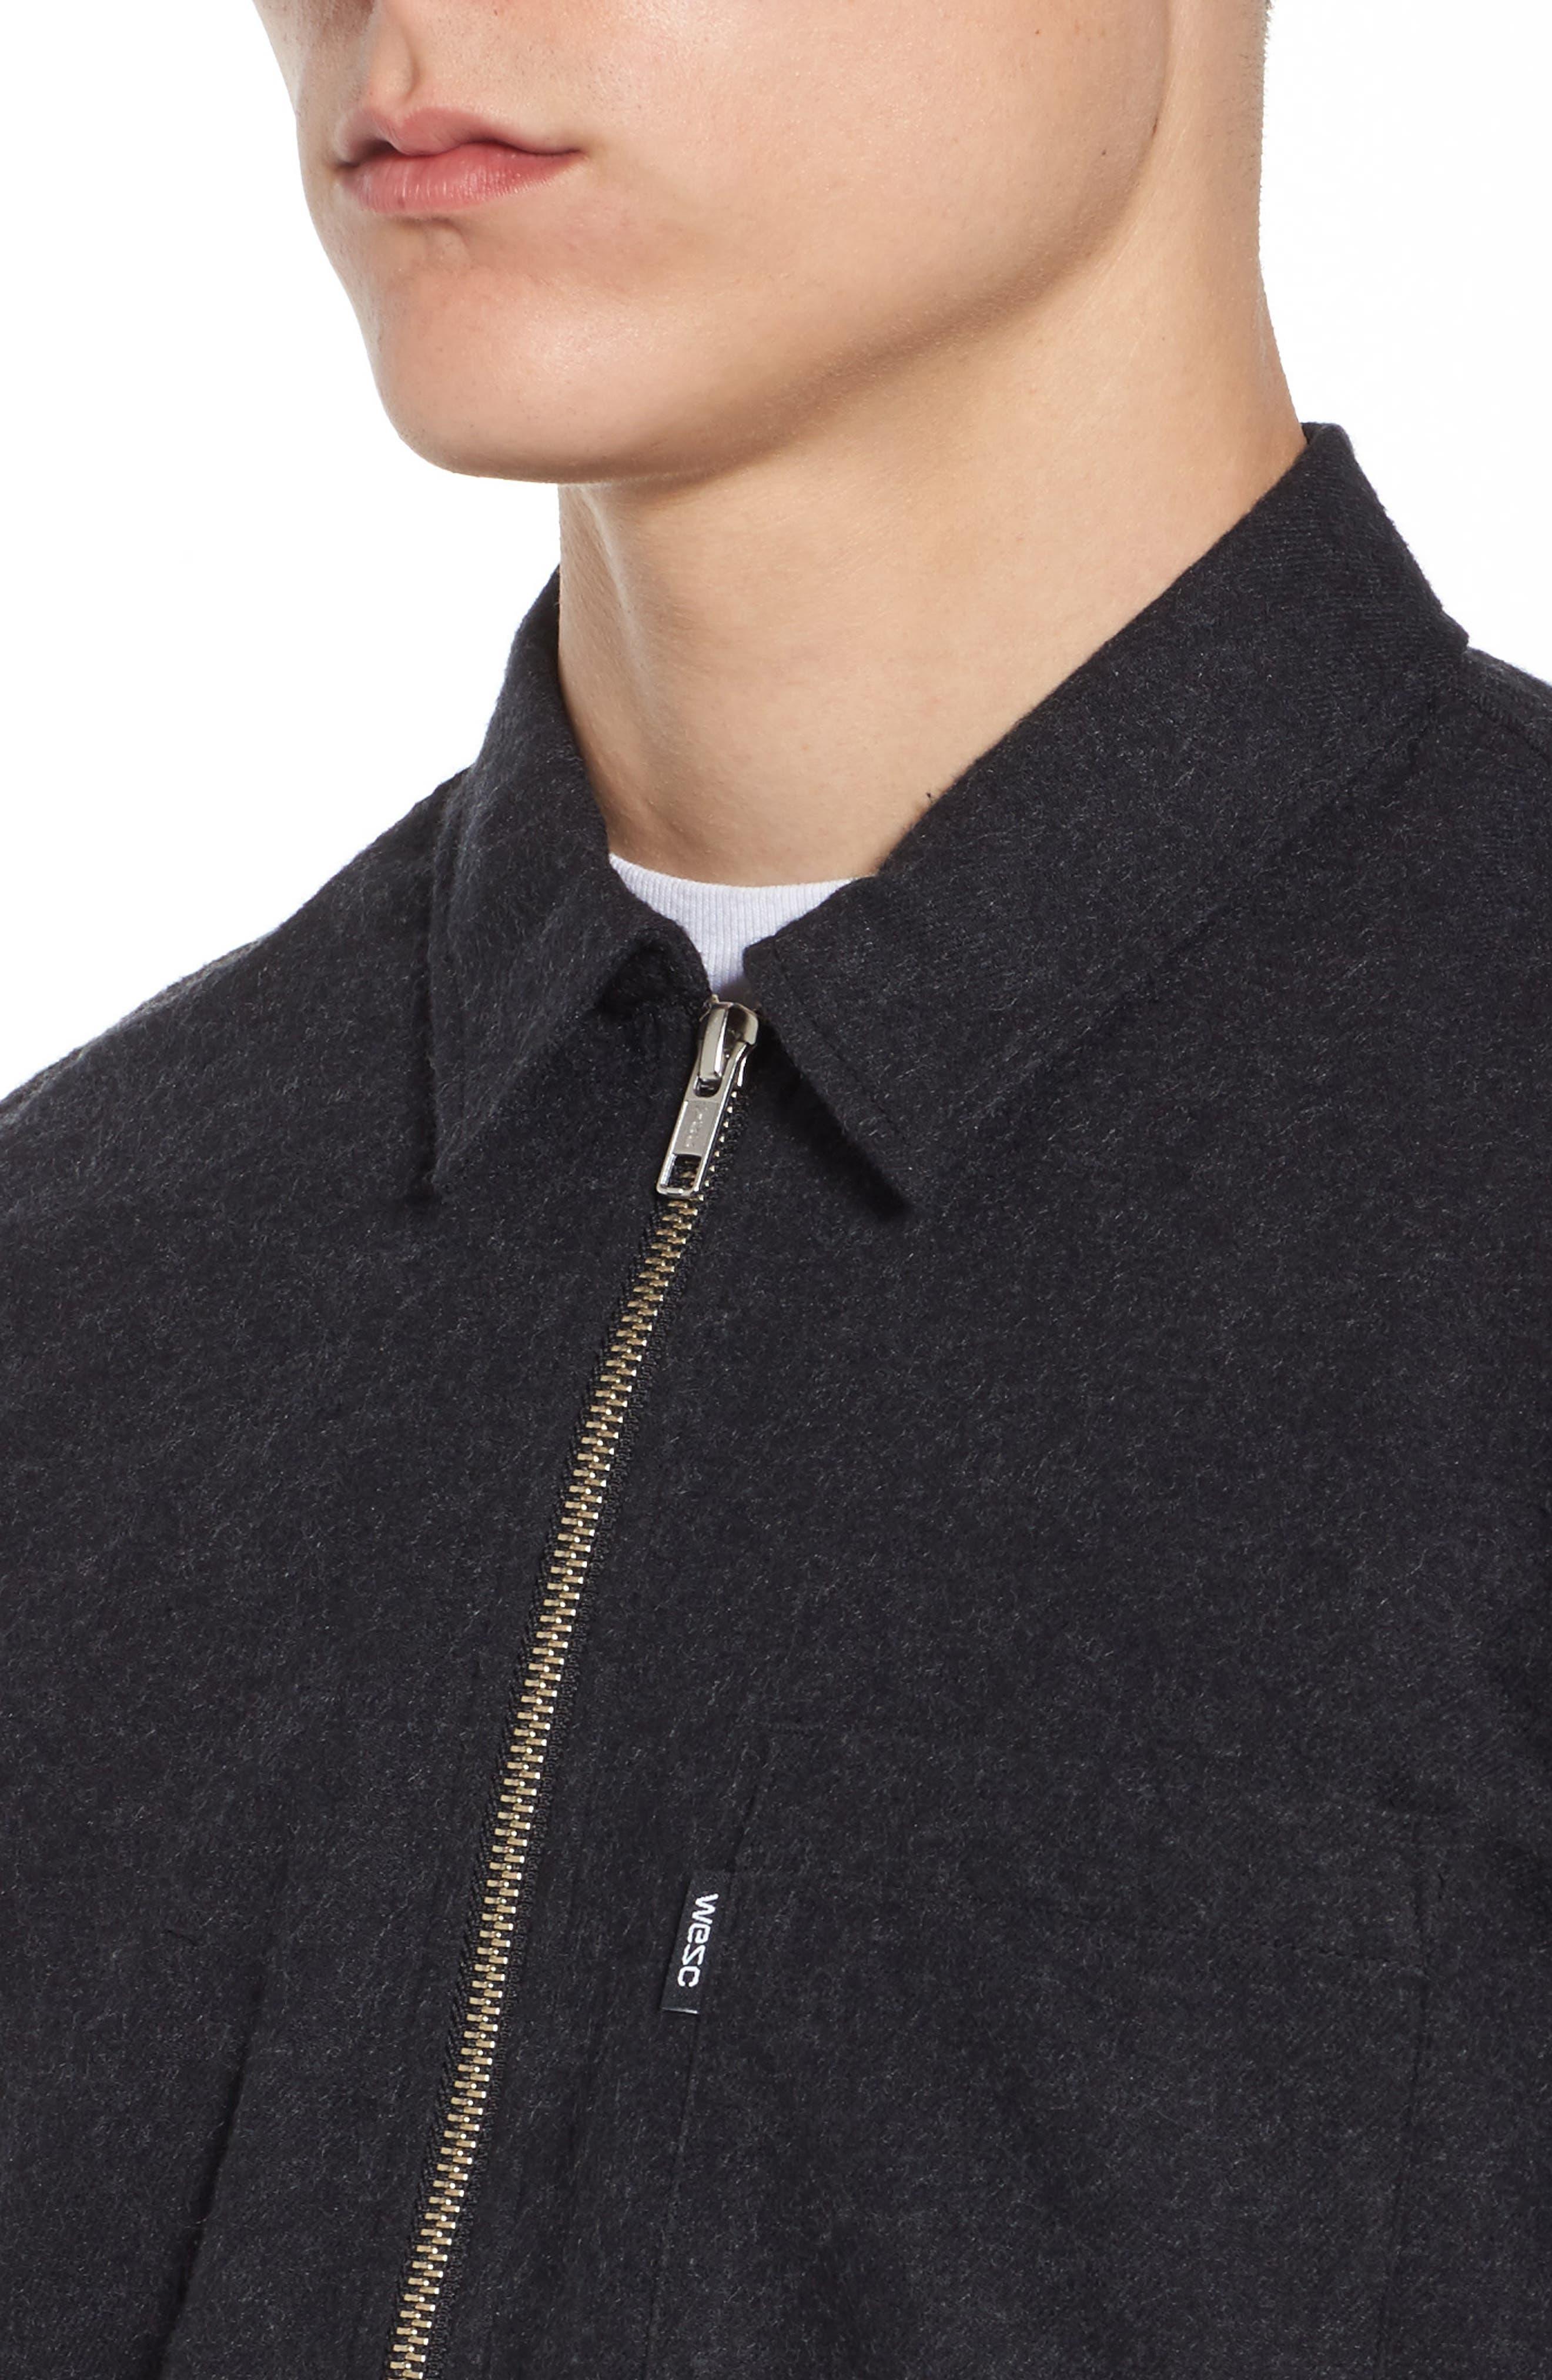 Nicks Flannel Zip Overshirt,                             Alternate thumbnail 4, color,                             001